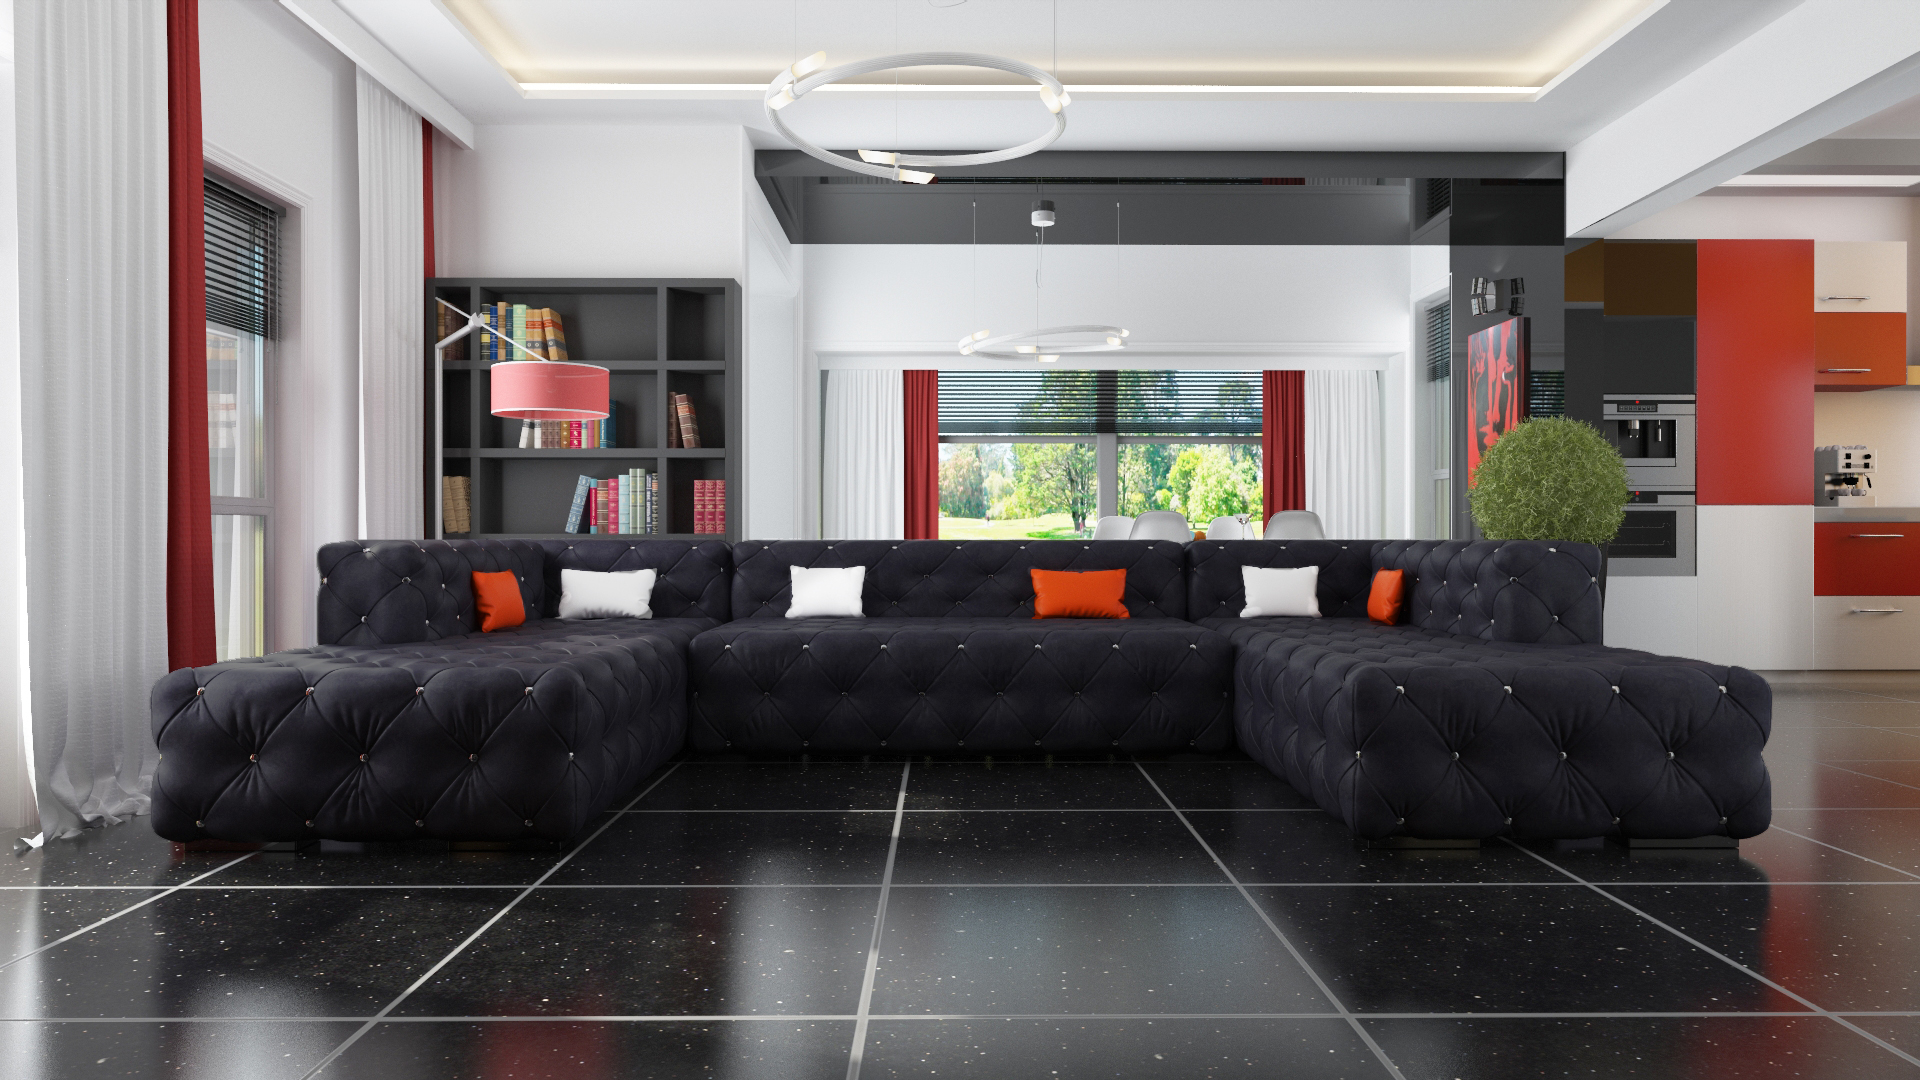 ecksofa chesterfield wohnlandschaft luxus designer sofa couch polster ecksofa ebay. Black Bedroom Furniture Sets. Home Design Ideas